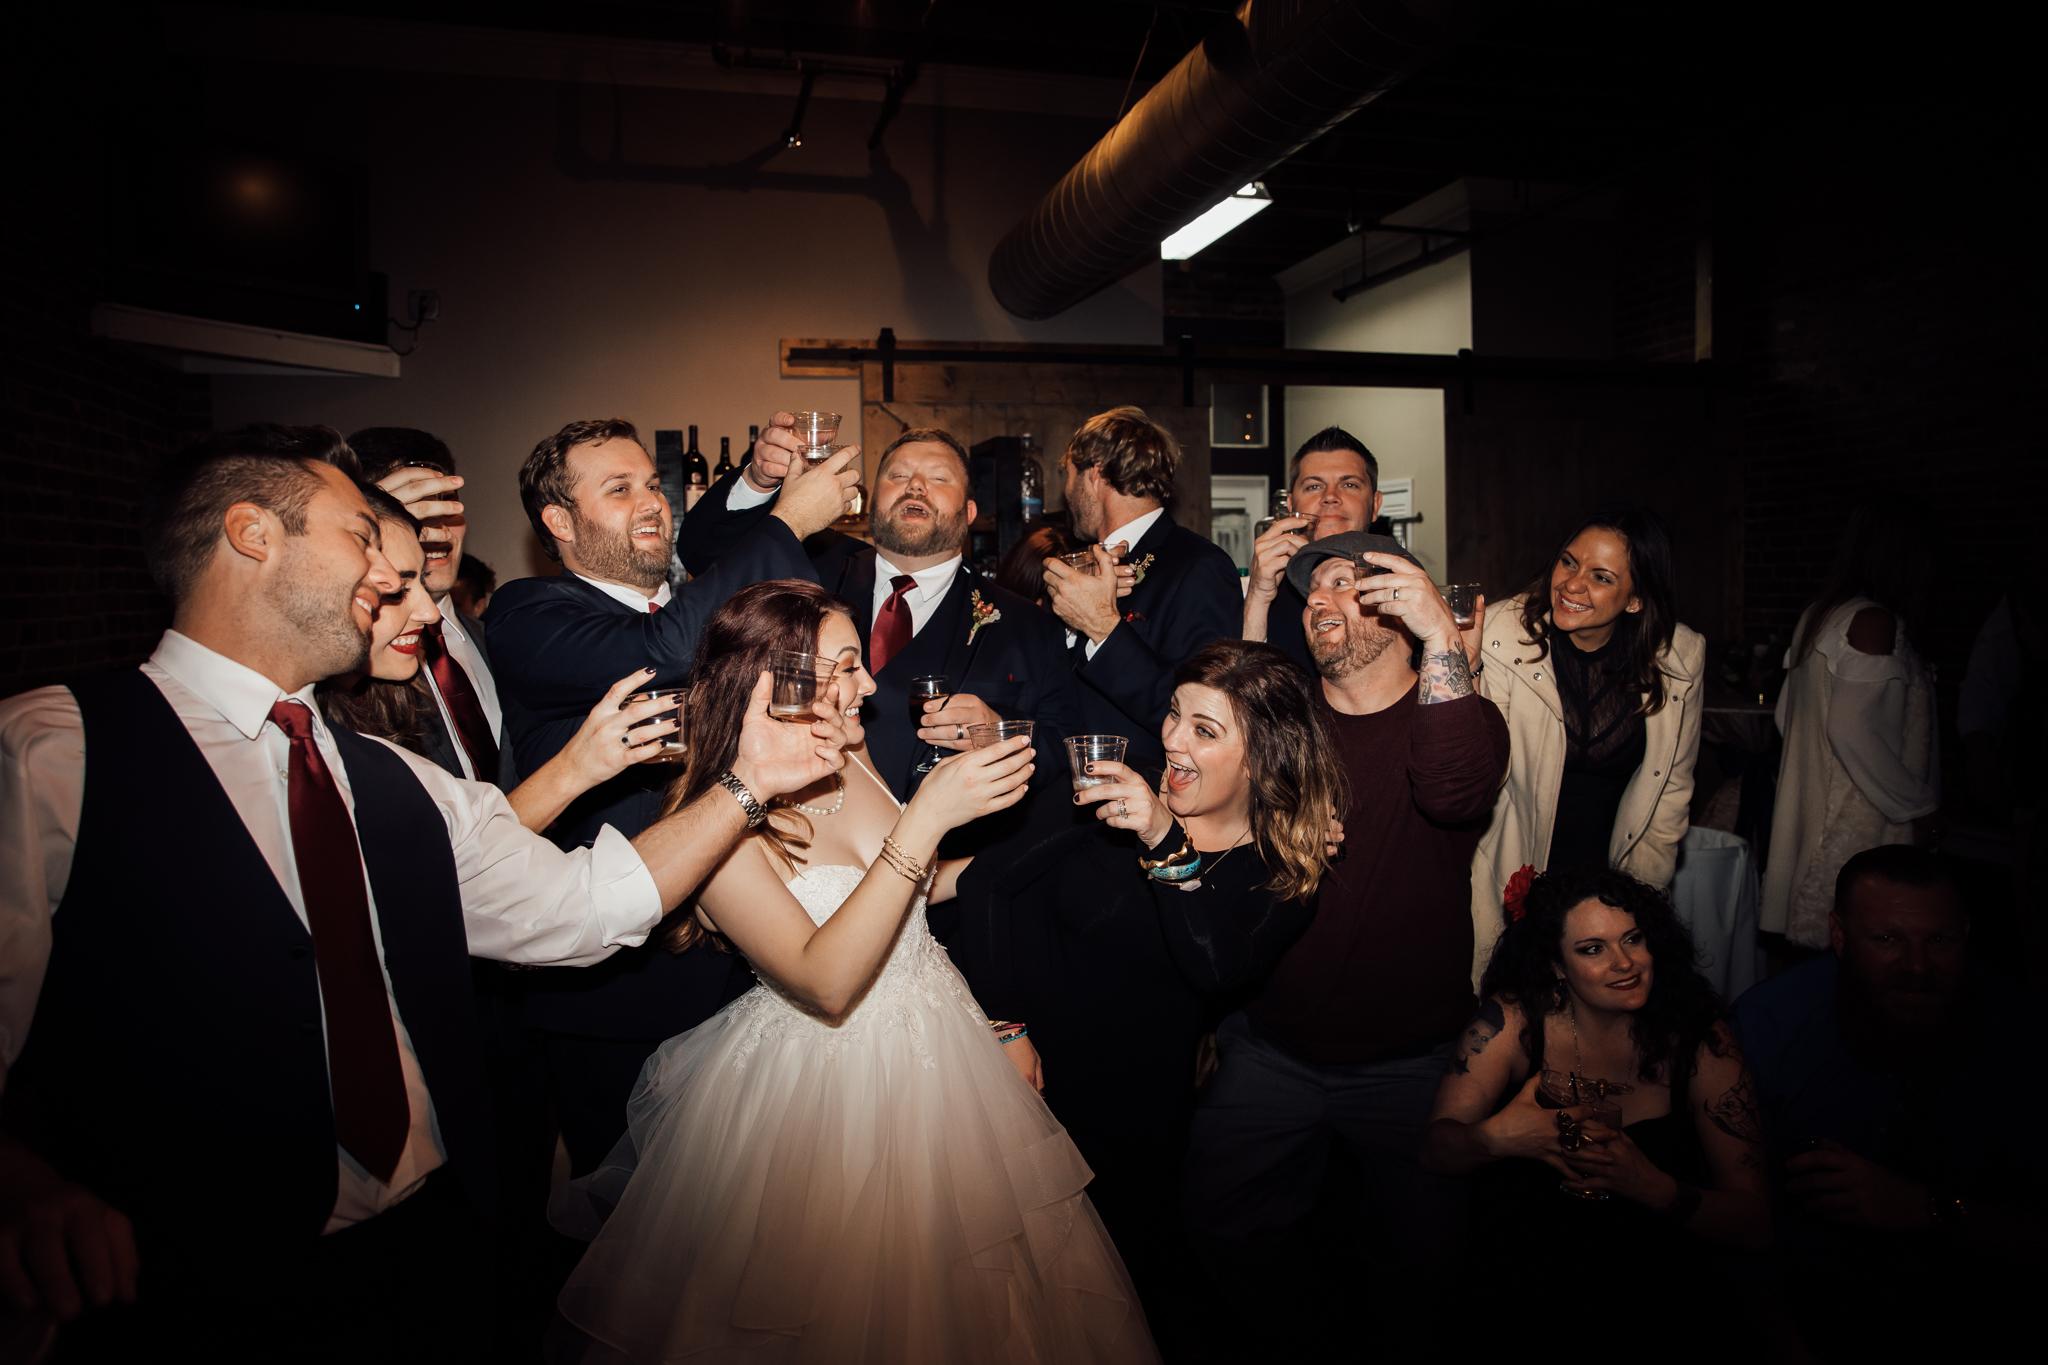 memphis-wedding-photographers-thewarmtharoundyou-ballinese-ballroom (4 of 8).jpg